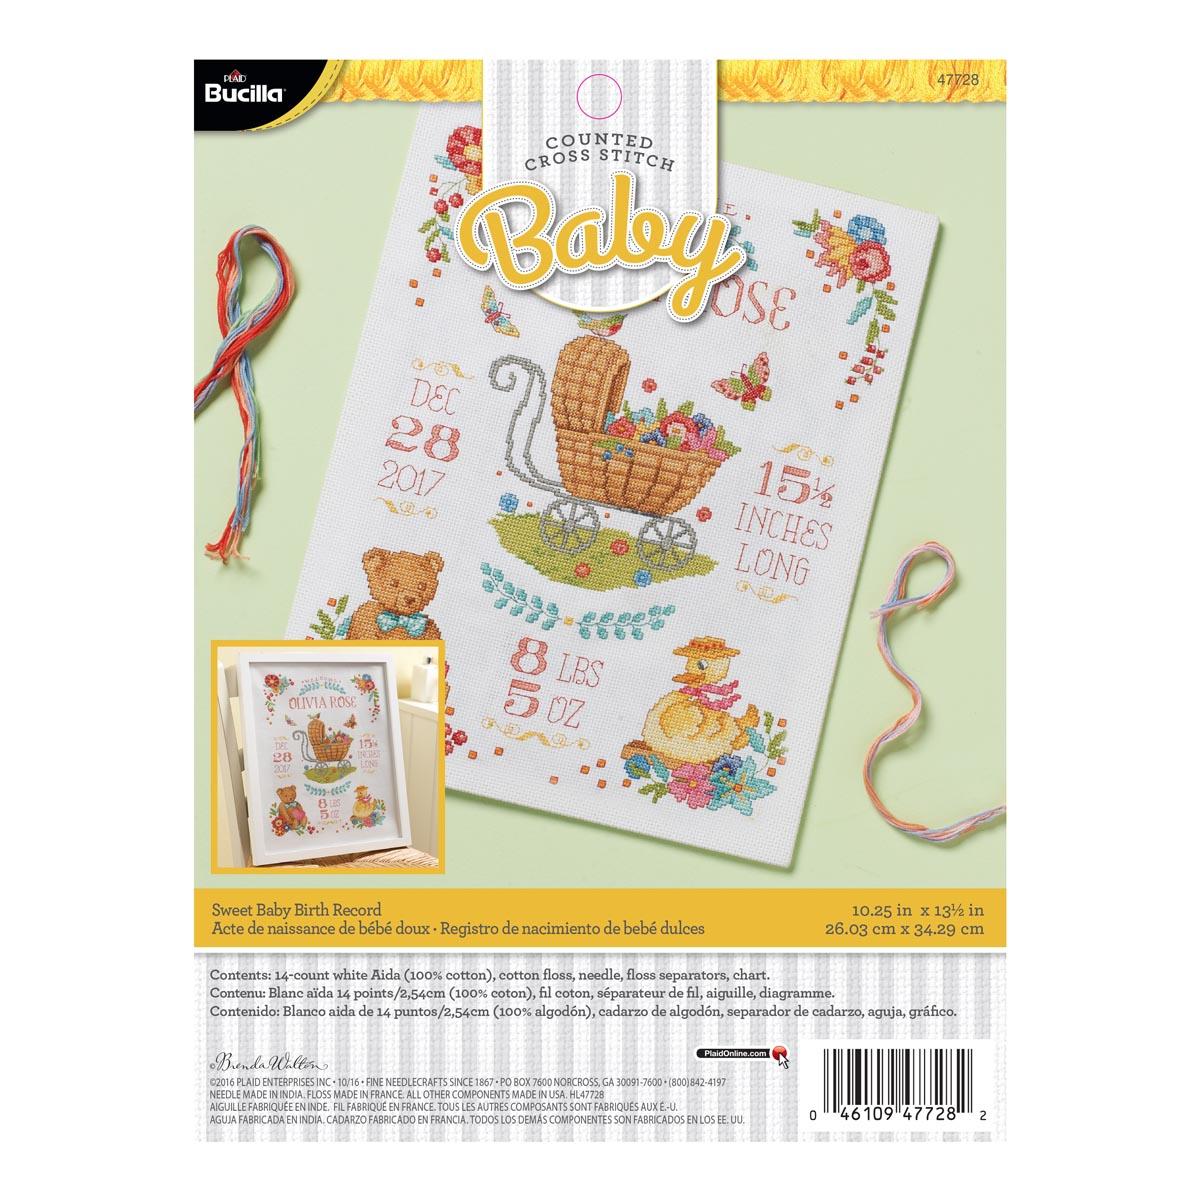 Bucilla ® Baby - Counted Cross Stitch - Crib Ensembles - Sweet Baby - Birth Record Kit